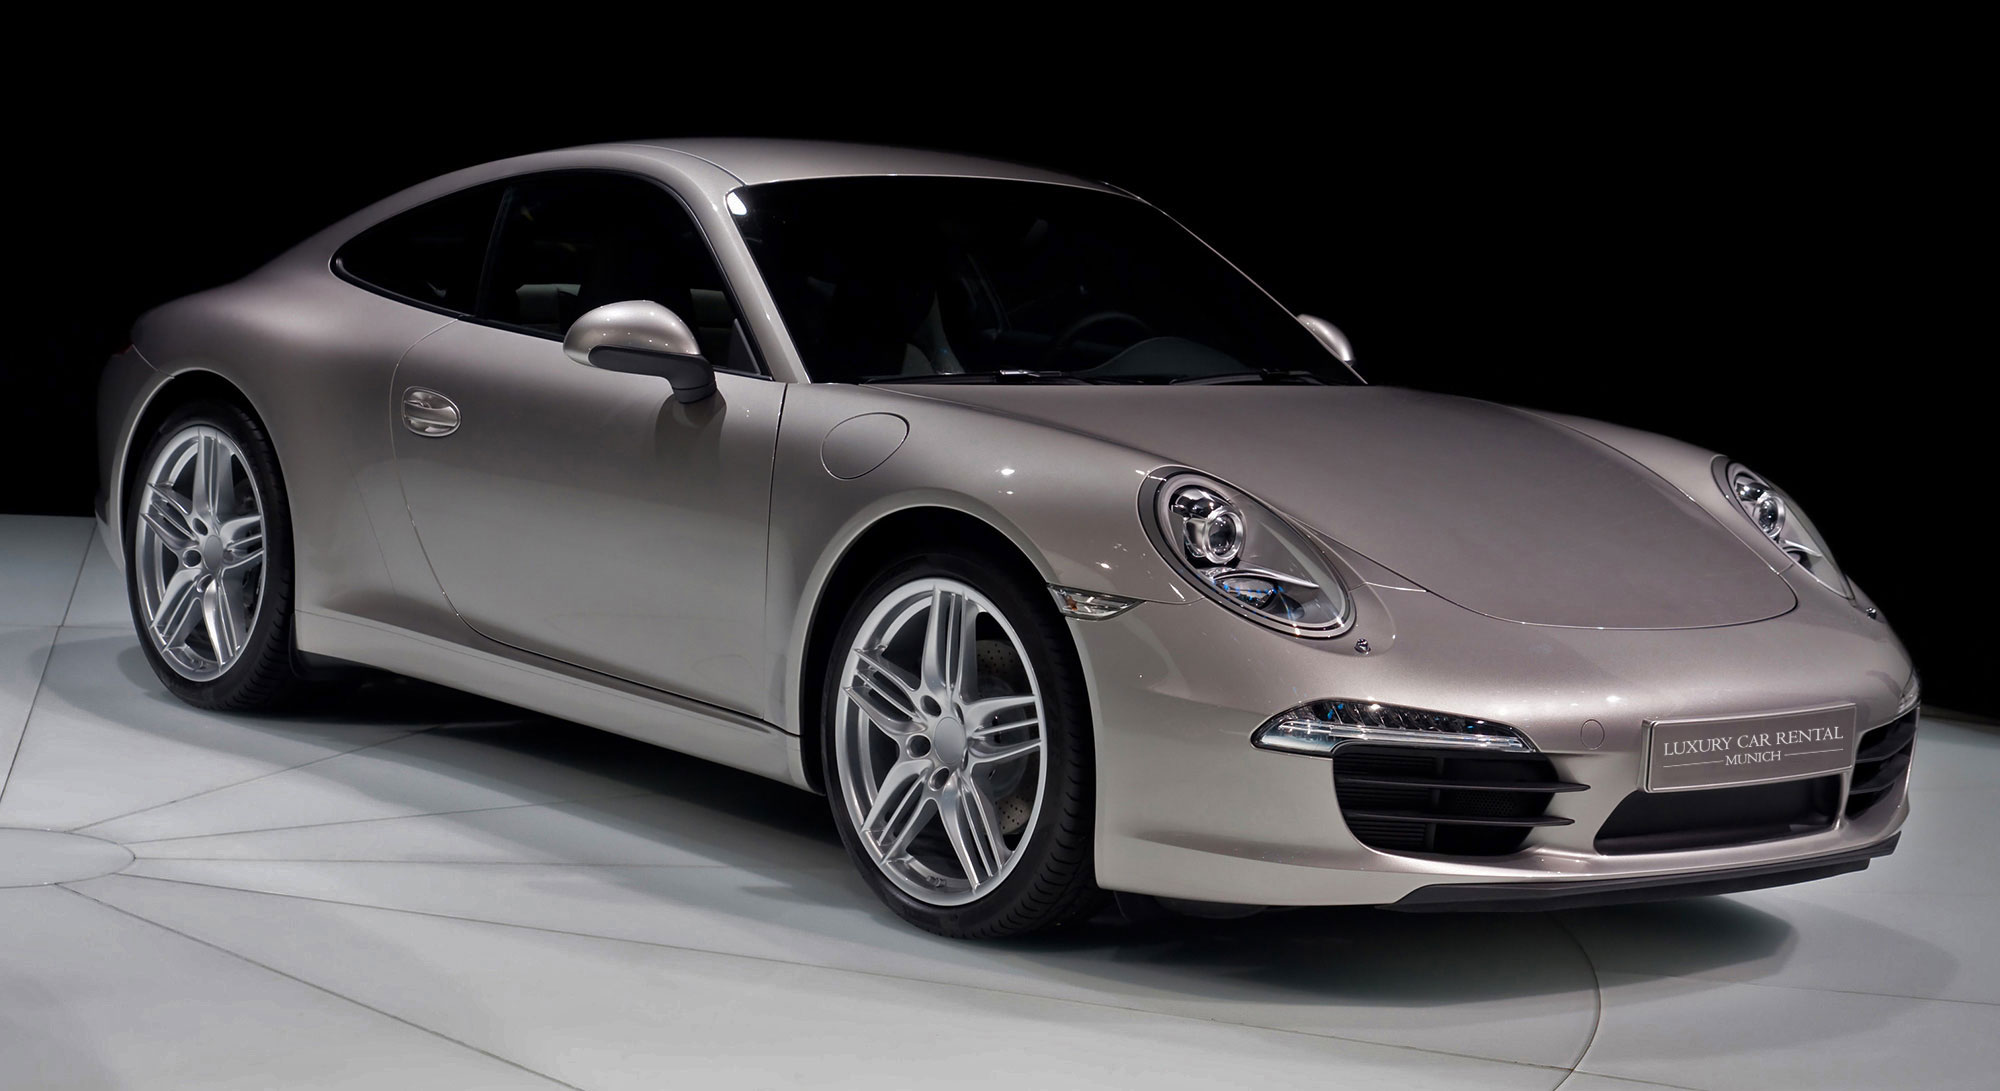 luxury car rental munich sport car rental car hire. Black Bedroom Furniture Sets. Home Design Ideas